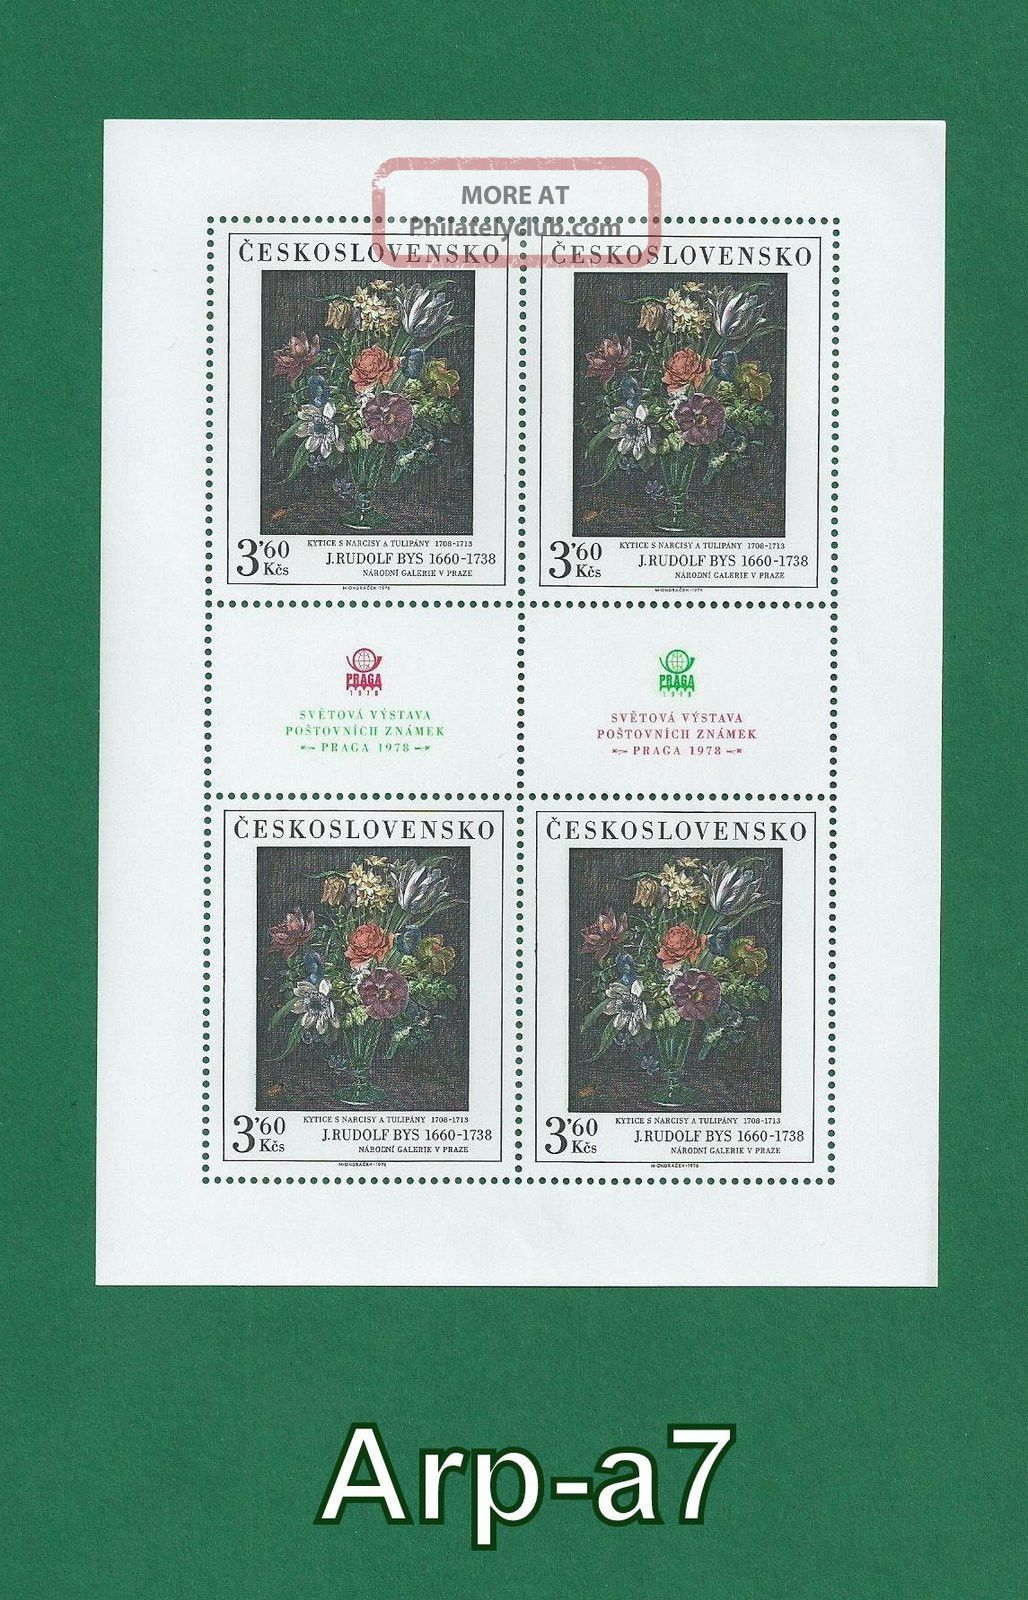 Czechoslovakia Counter Sheet Art (daffodils And Tulips) 1976 Europe photo